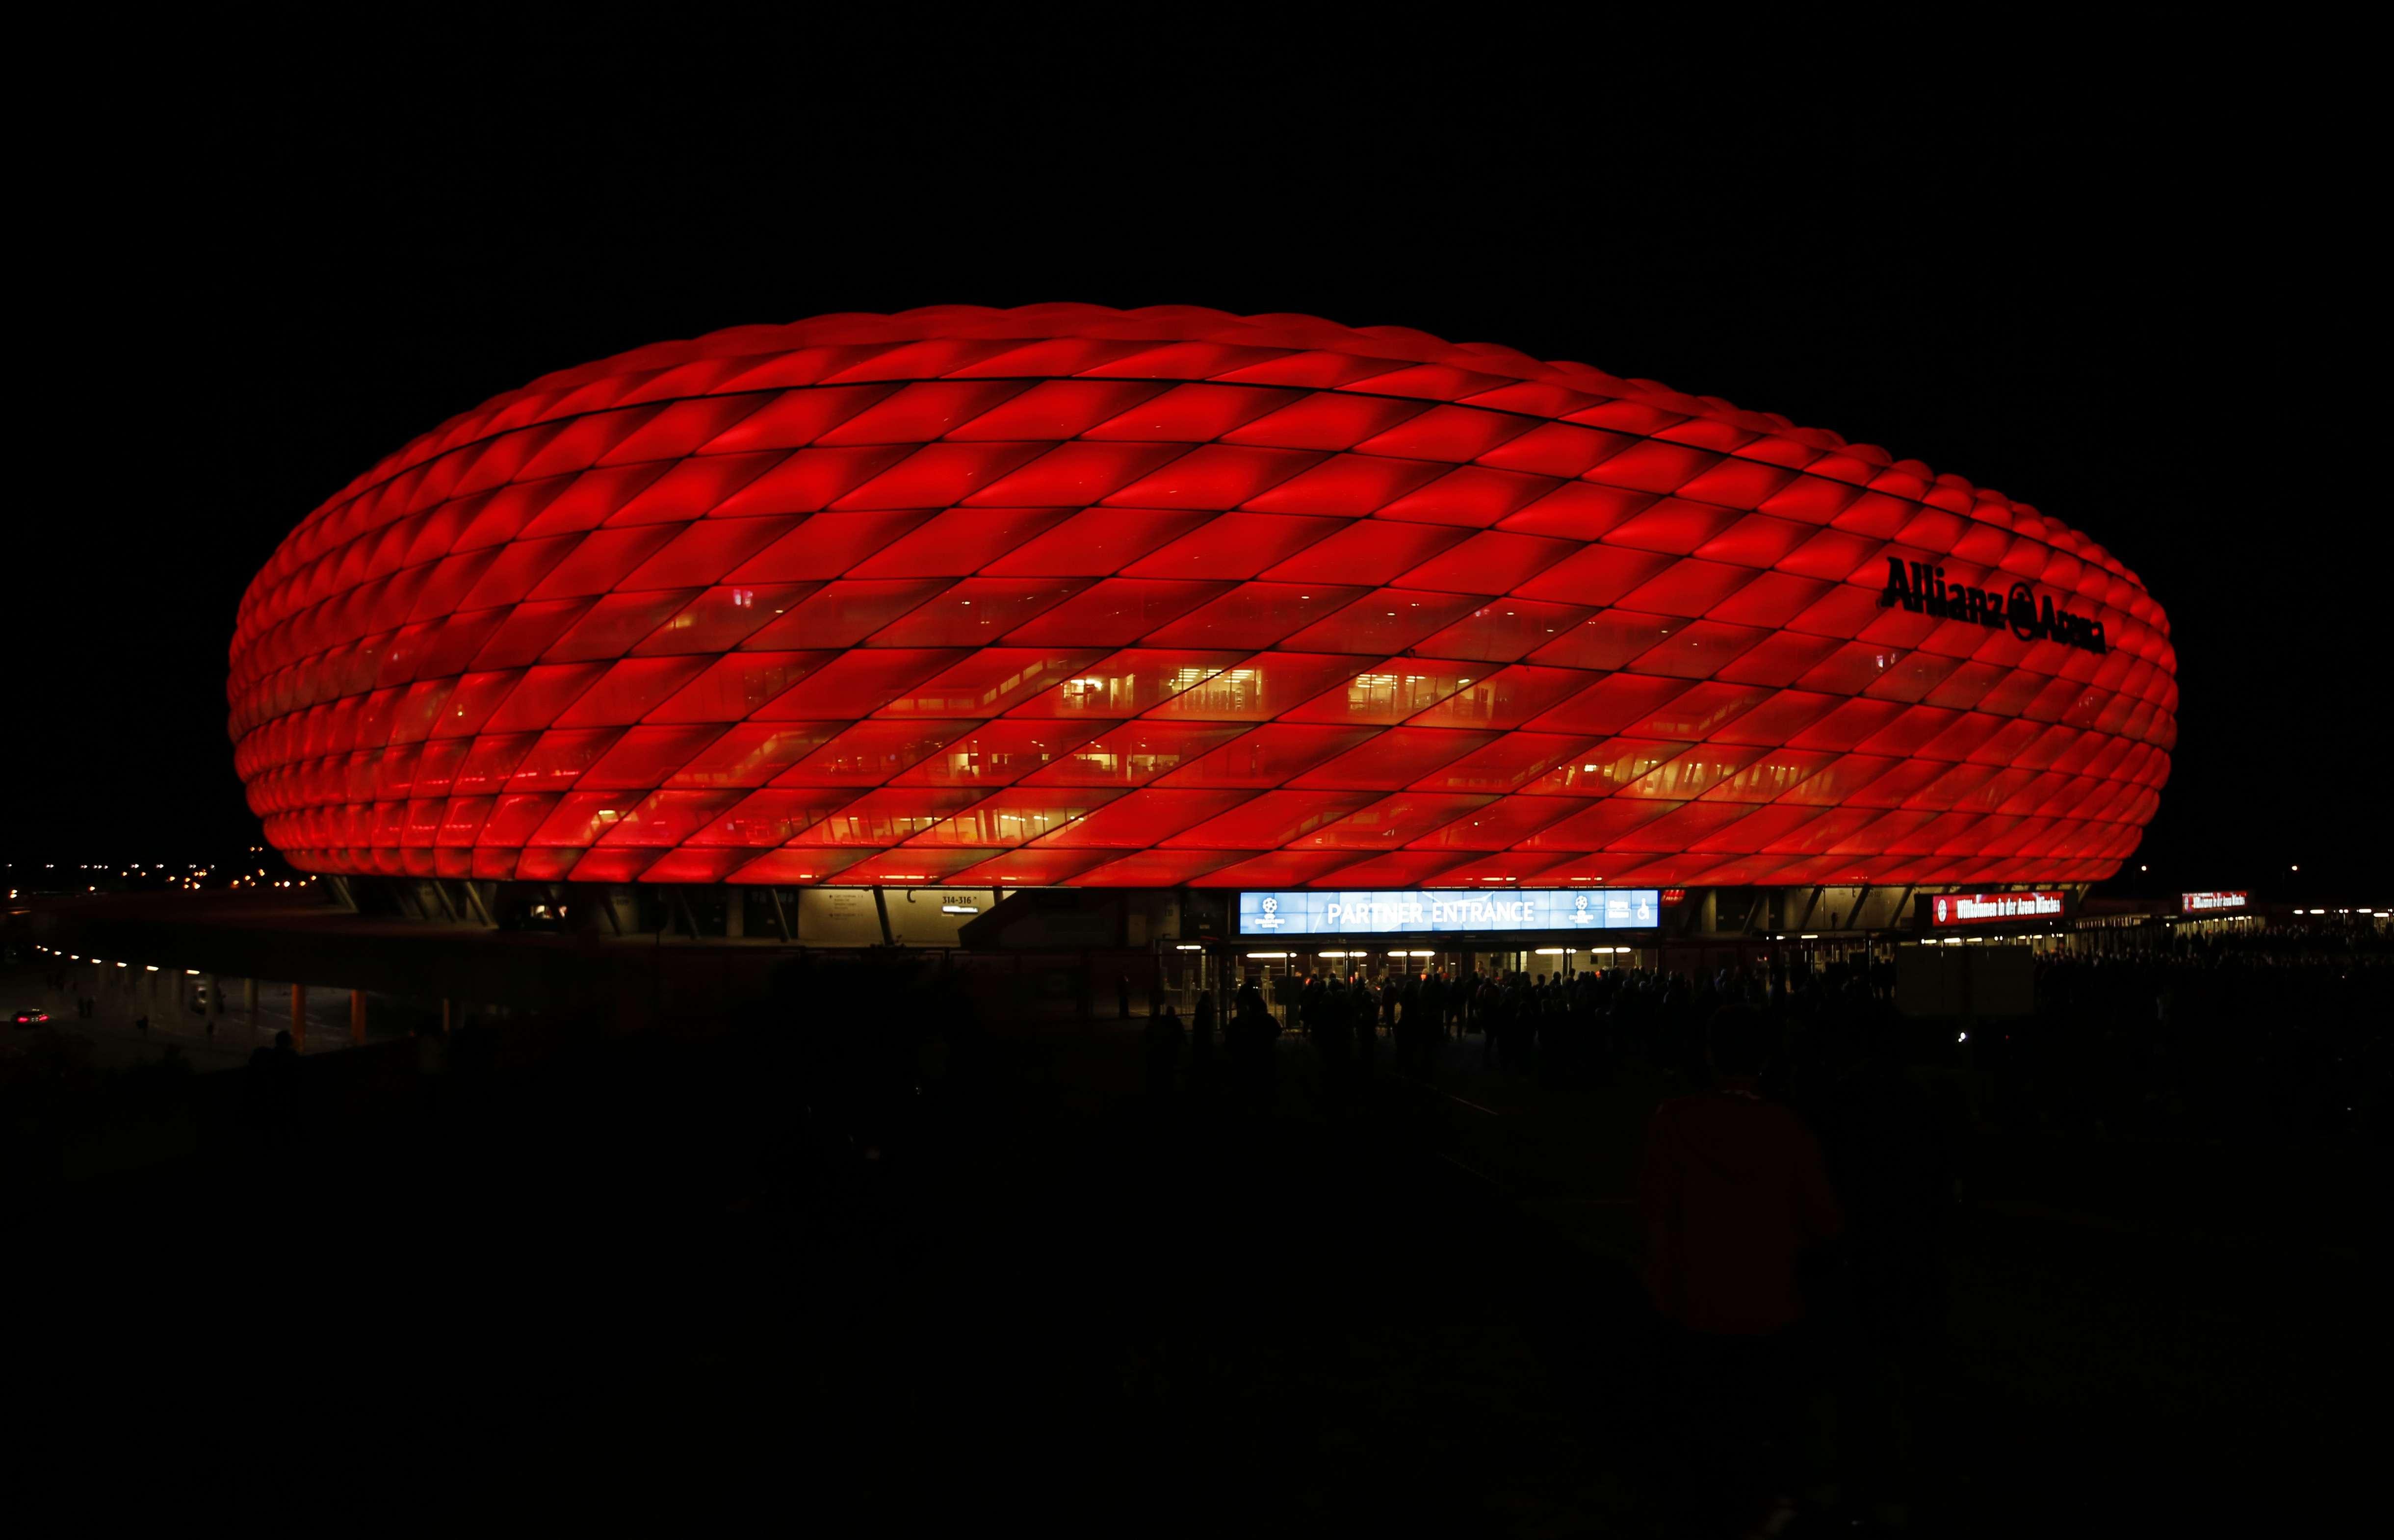 wallpaper german football team